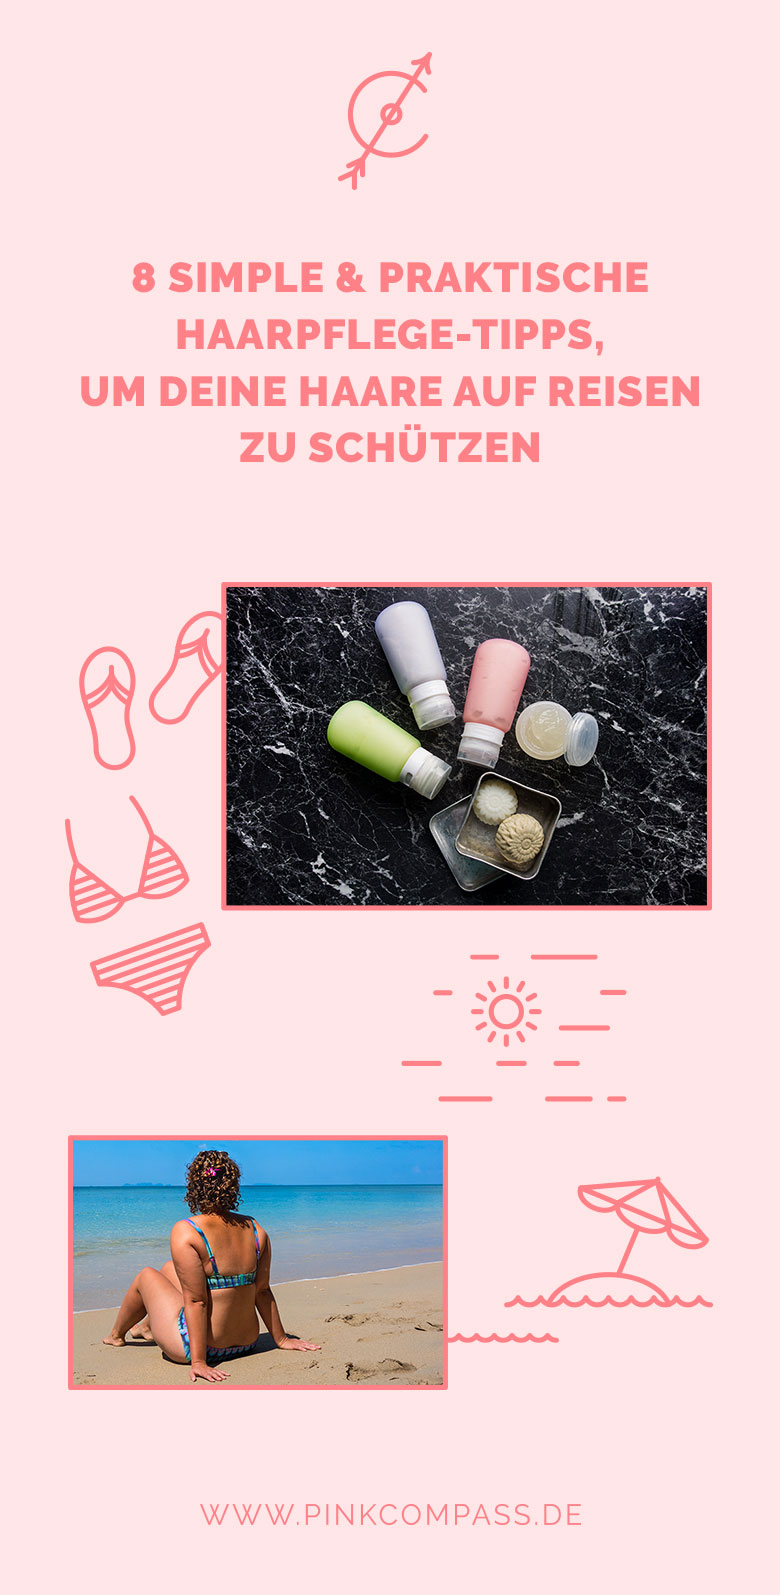 Haarpflege-Tipps-Reisen